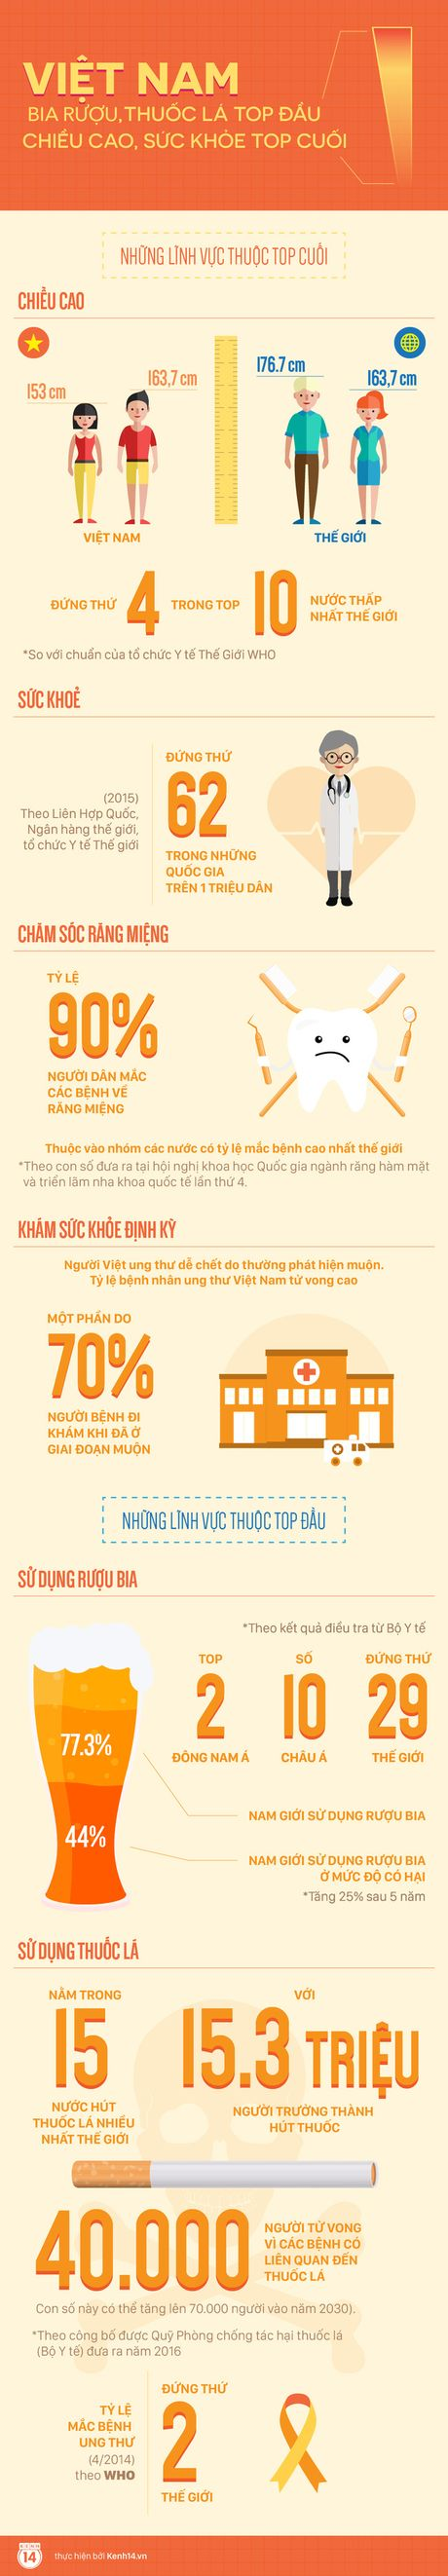 Nguoi Viet Nam so voi the gioi: Bia ruou, thuoc la top dau; Chieu cao, suc khoe top cuoi - Anh 1